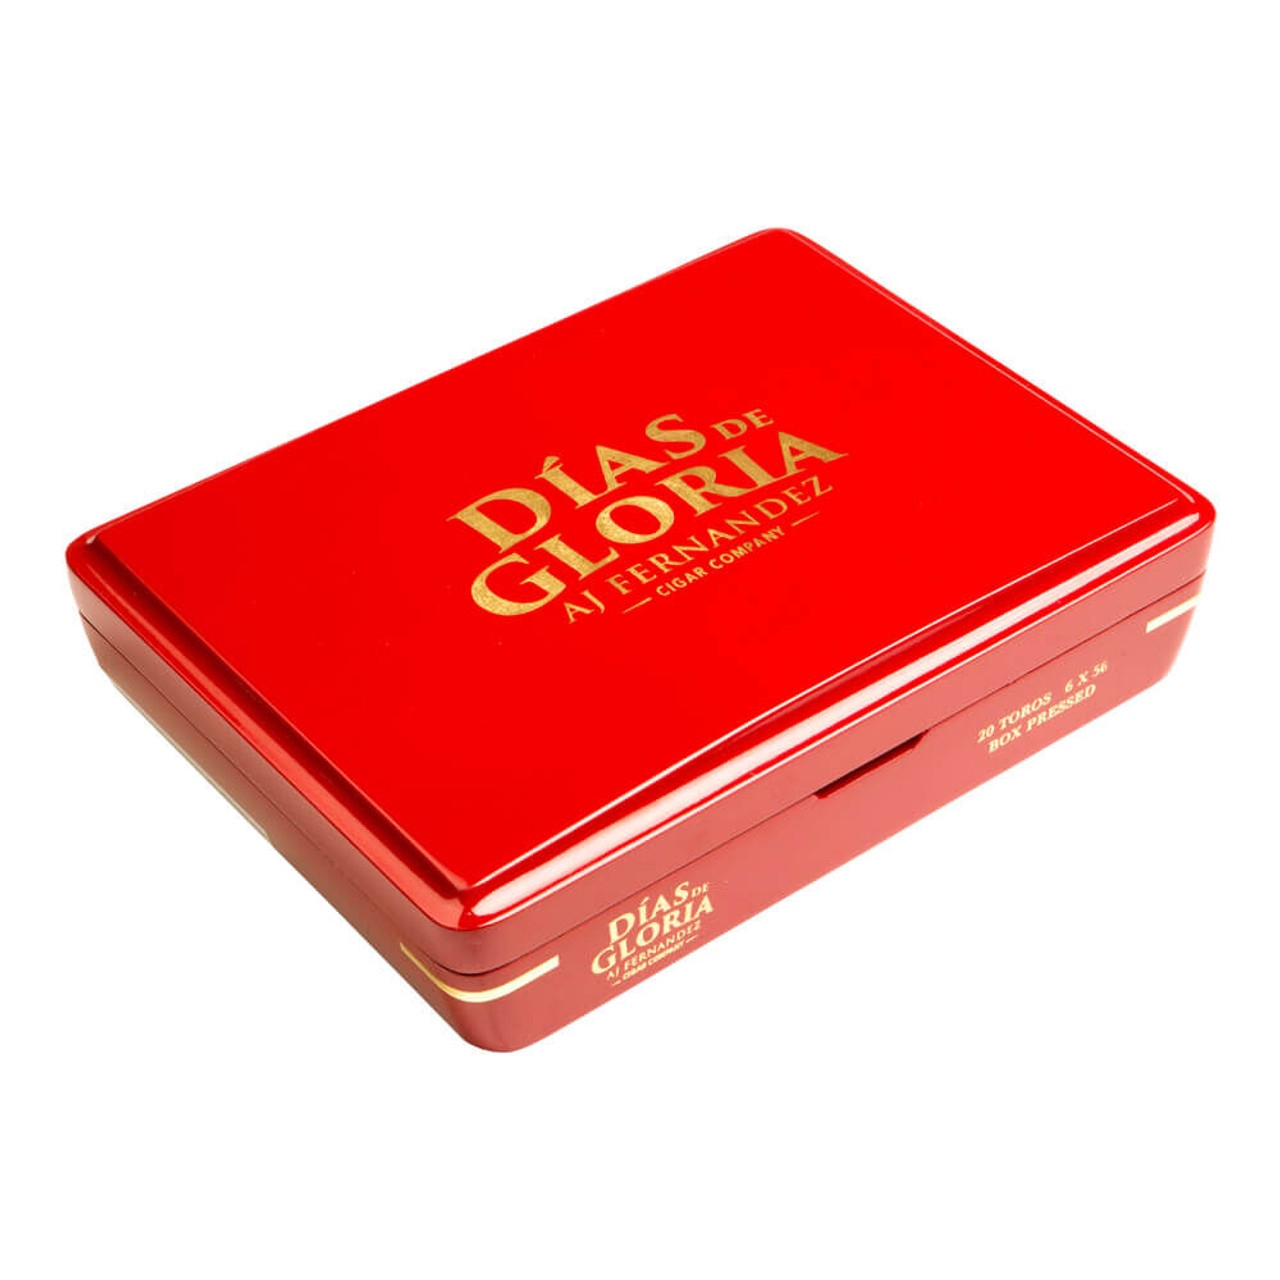 AJ Fernandez Dias de Gloria Toro Cigars - 6.0 x 56 (Box of 20)